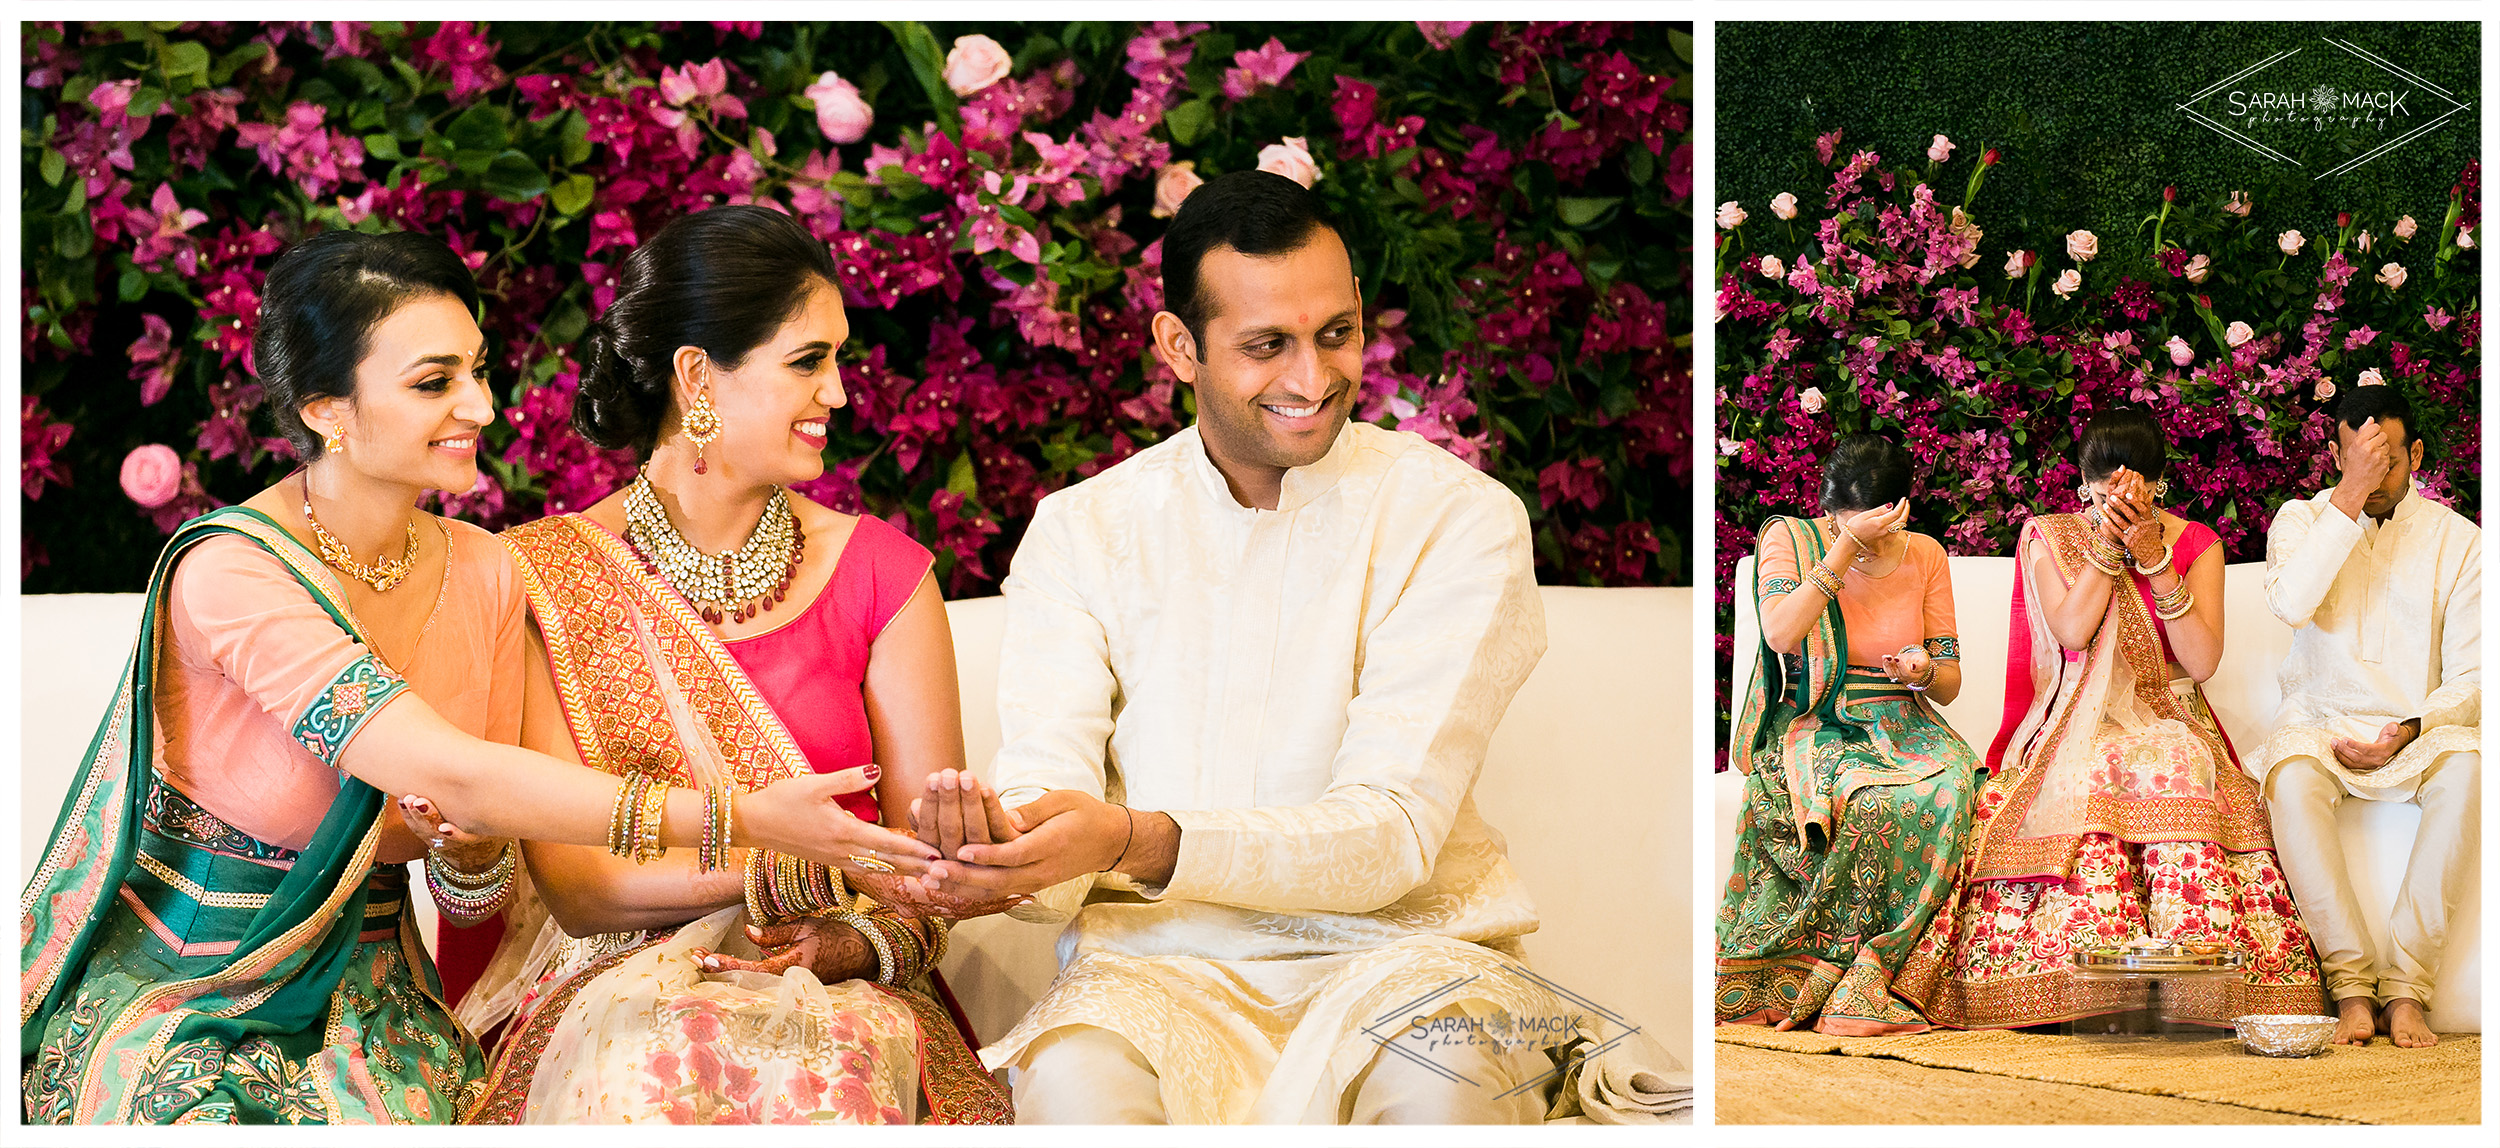 PR-Irvine-Ganesh-Pooja-Indian-Wedding-Photography-17.jpg